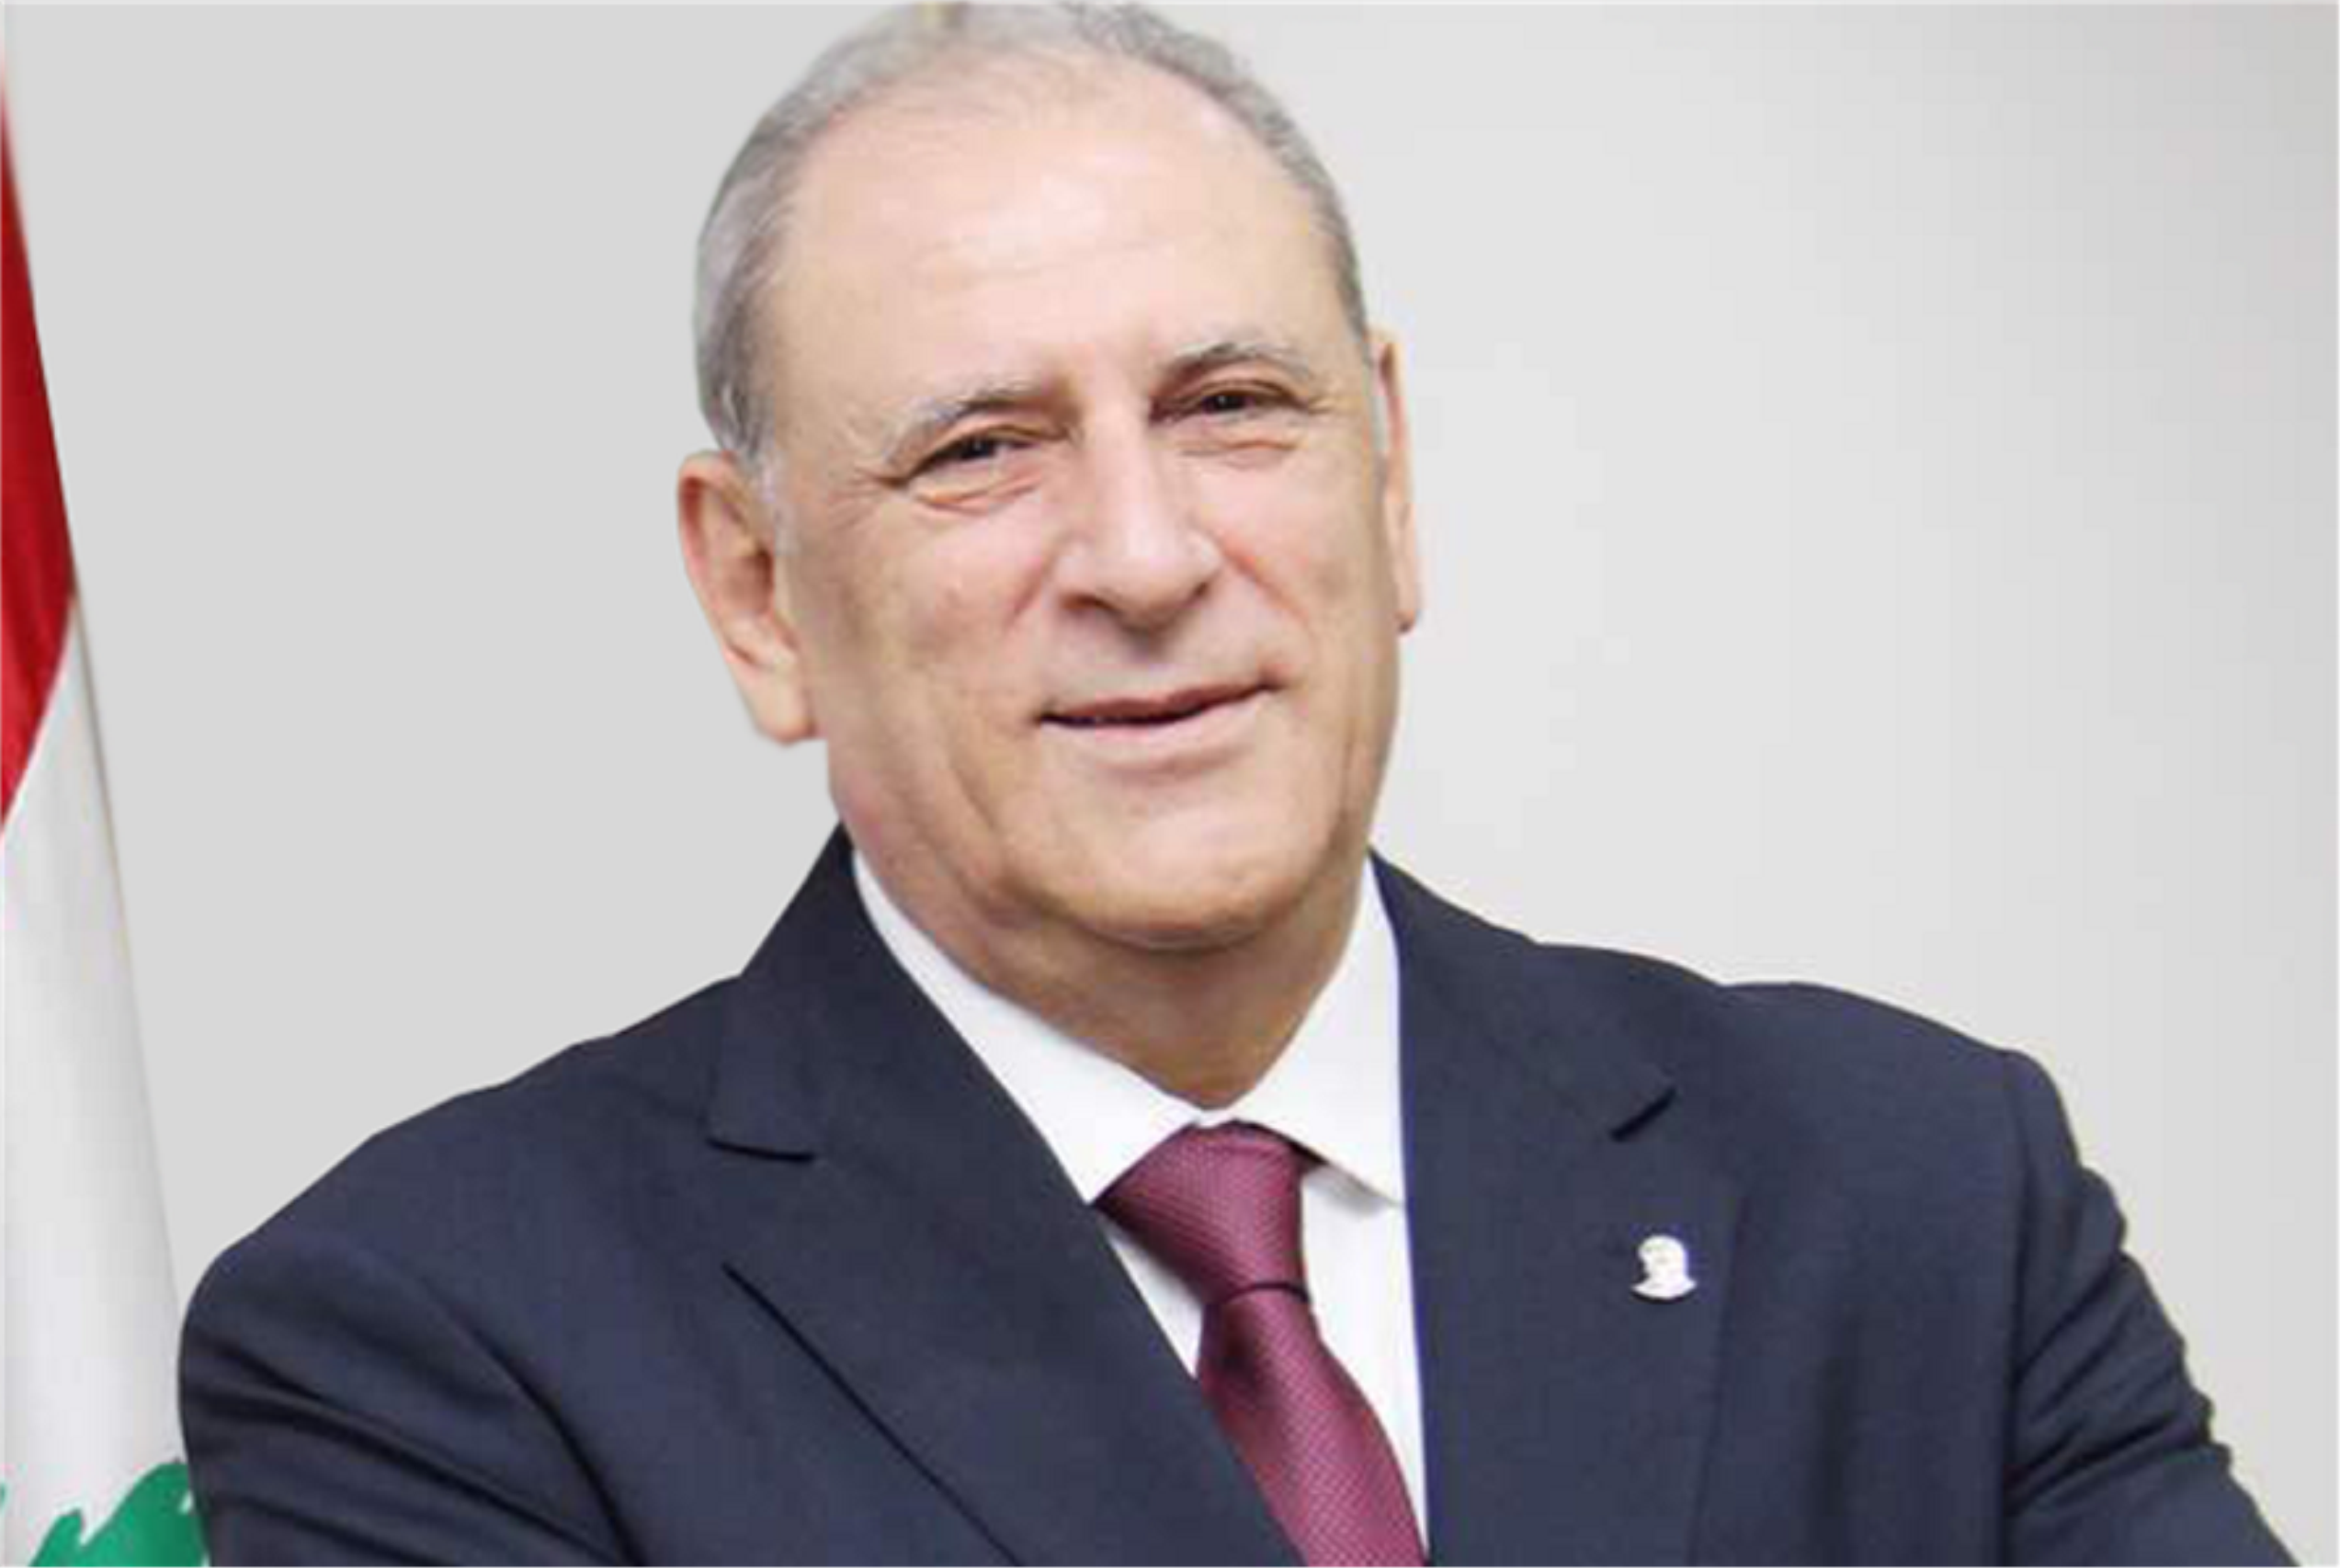 تلفزيون لبنان: الموظفون يصعّدون